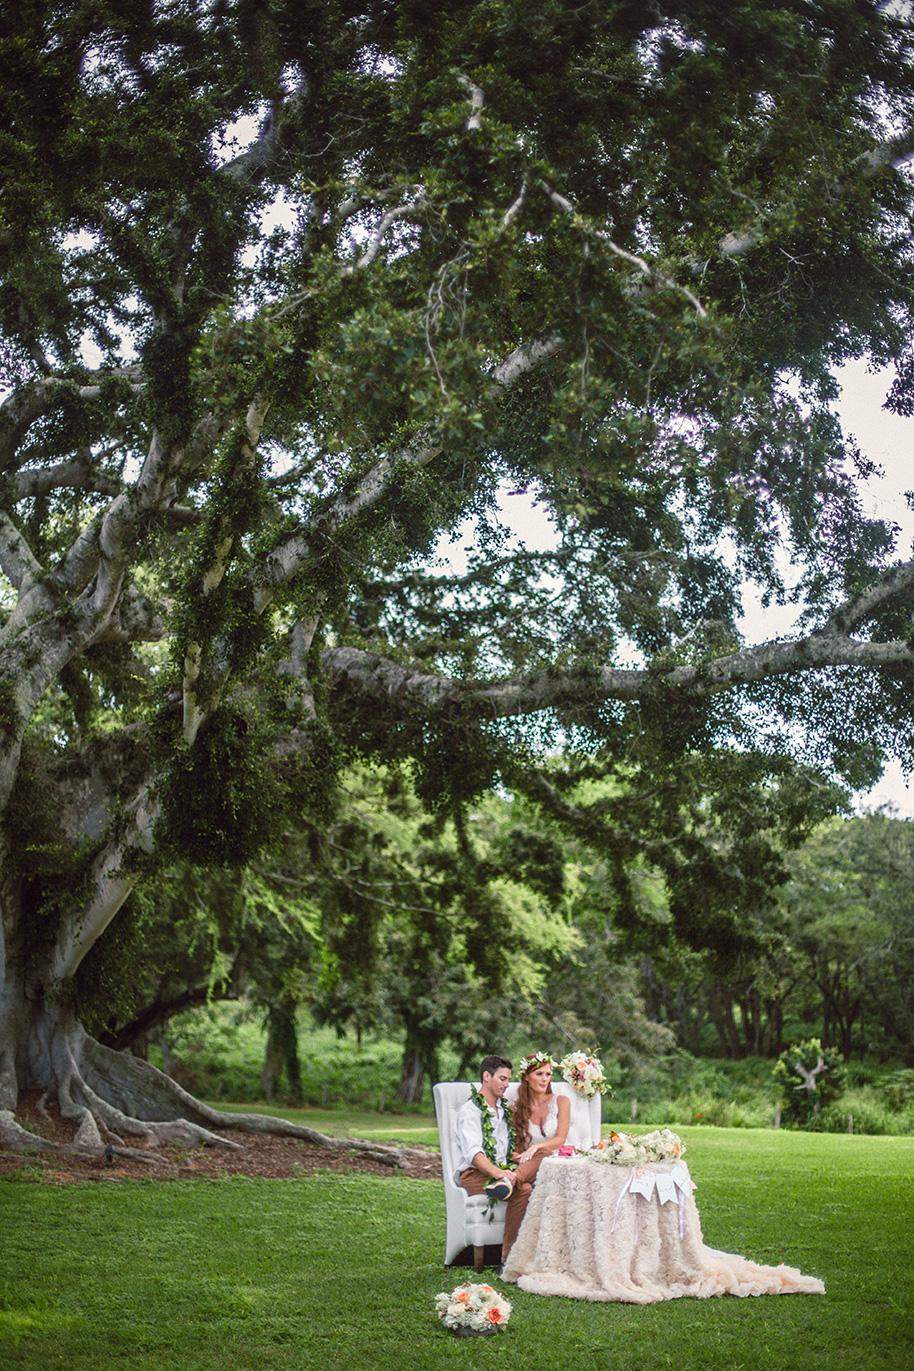 Dillingham-Ranch-Wedding-040516-21